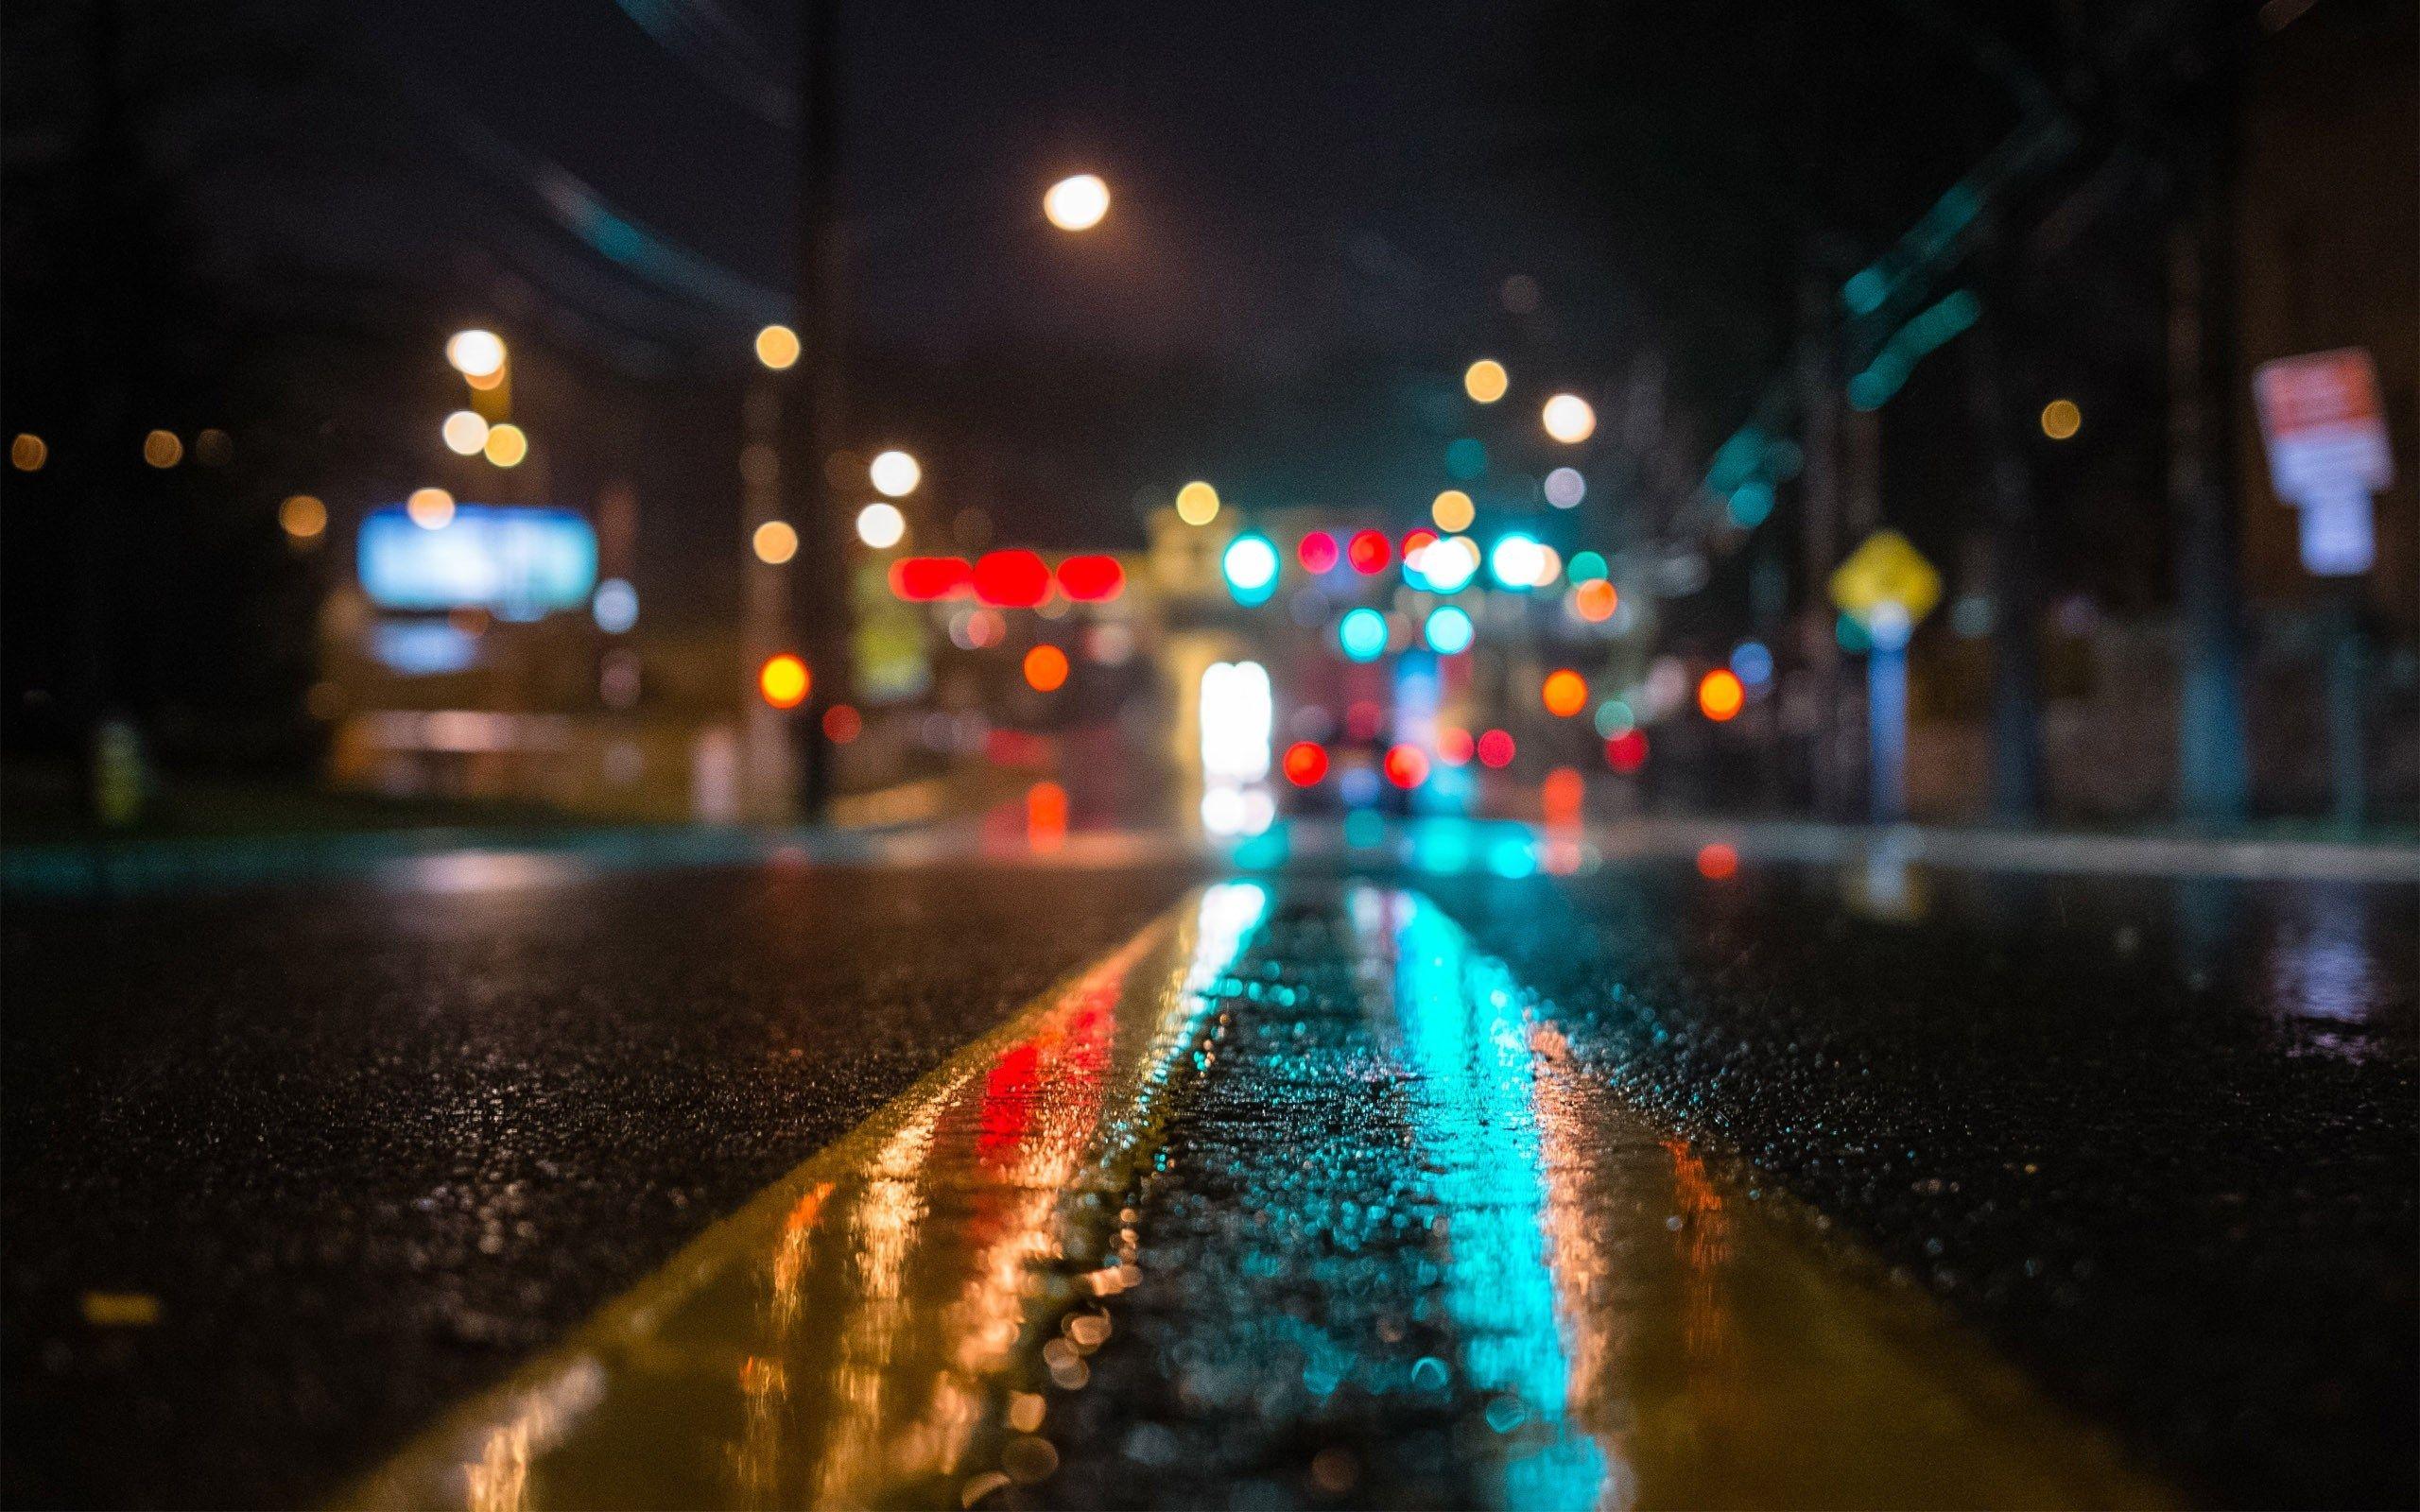 New York City Street Night Lights HD Wallpaper | FreeHDWall.Com ... for Street Lights At Night Hd  589ifm